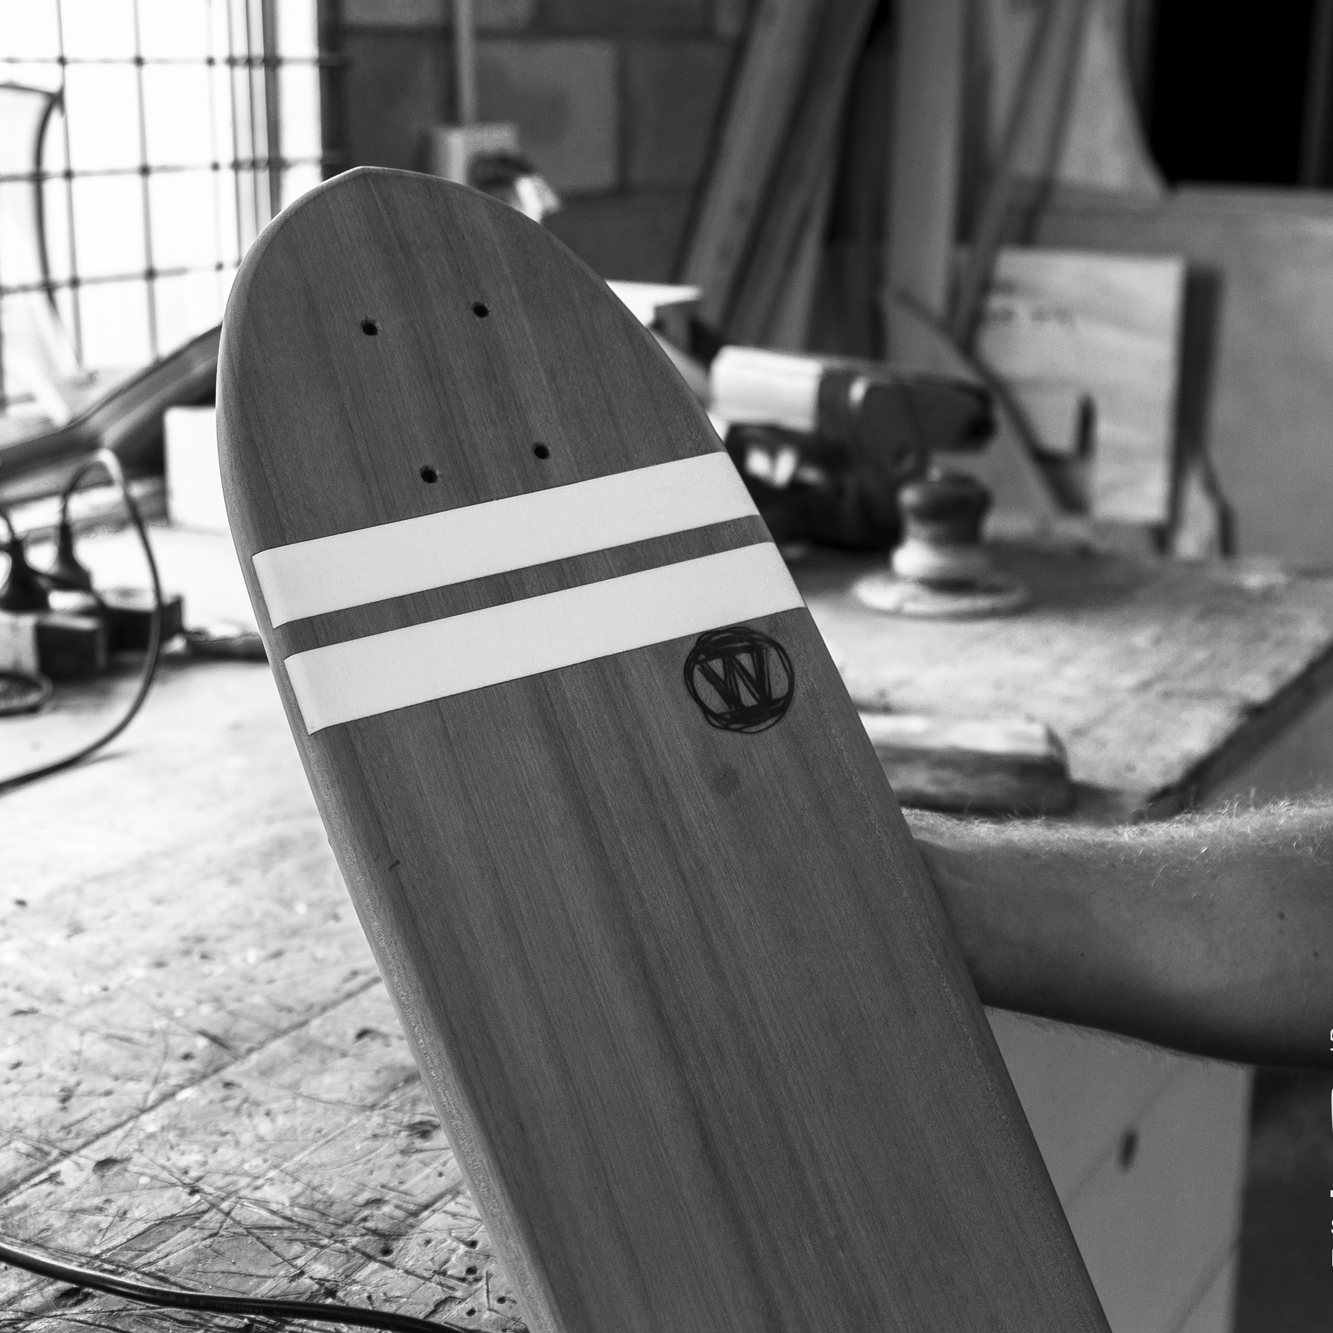 Worthy_skateboards_Samuel_Wiles_20.jpg